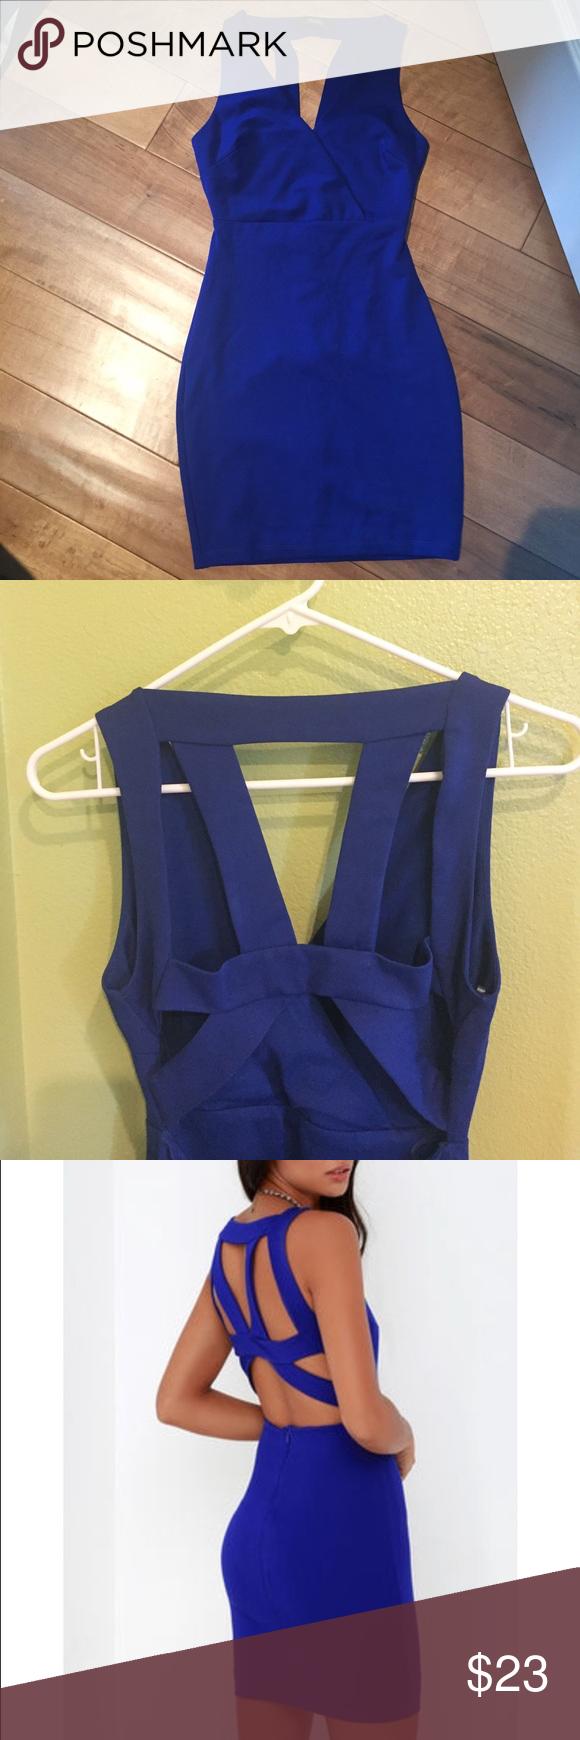 Lulu's Royal Blue Bodycon Dress Royal blue bodycon dress with straps across an open back. Never worn. Lulu's Dresses Mini